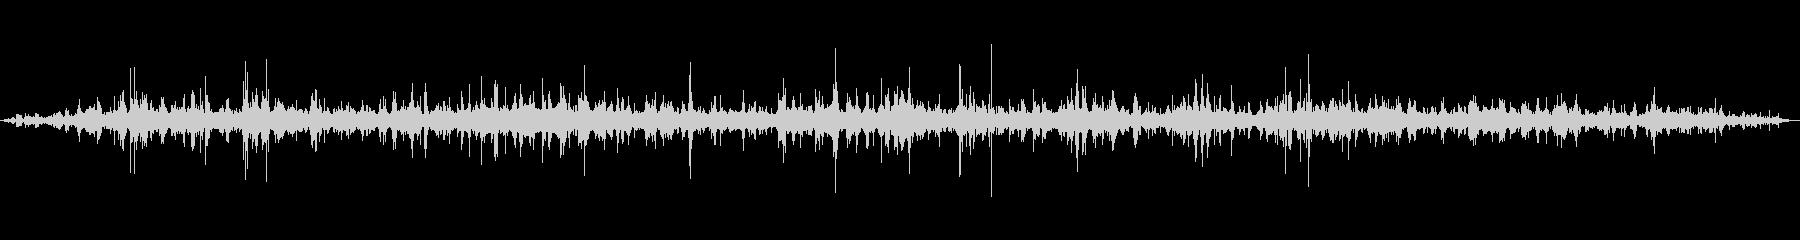 [ASMR]波打ち際の音_005の未再生の波形